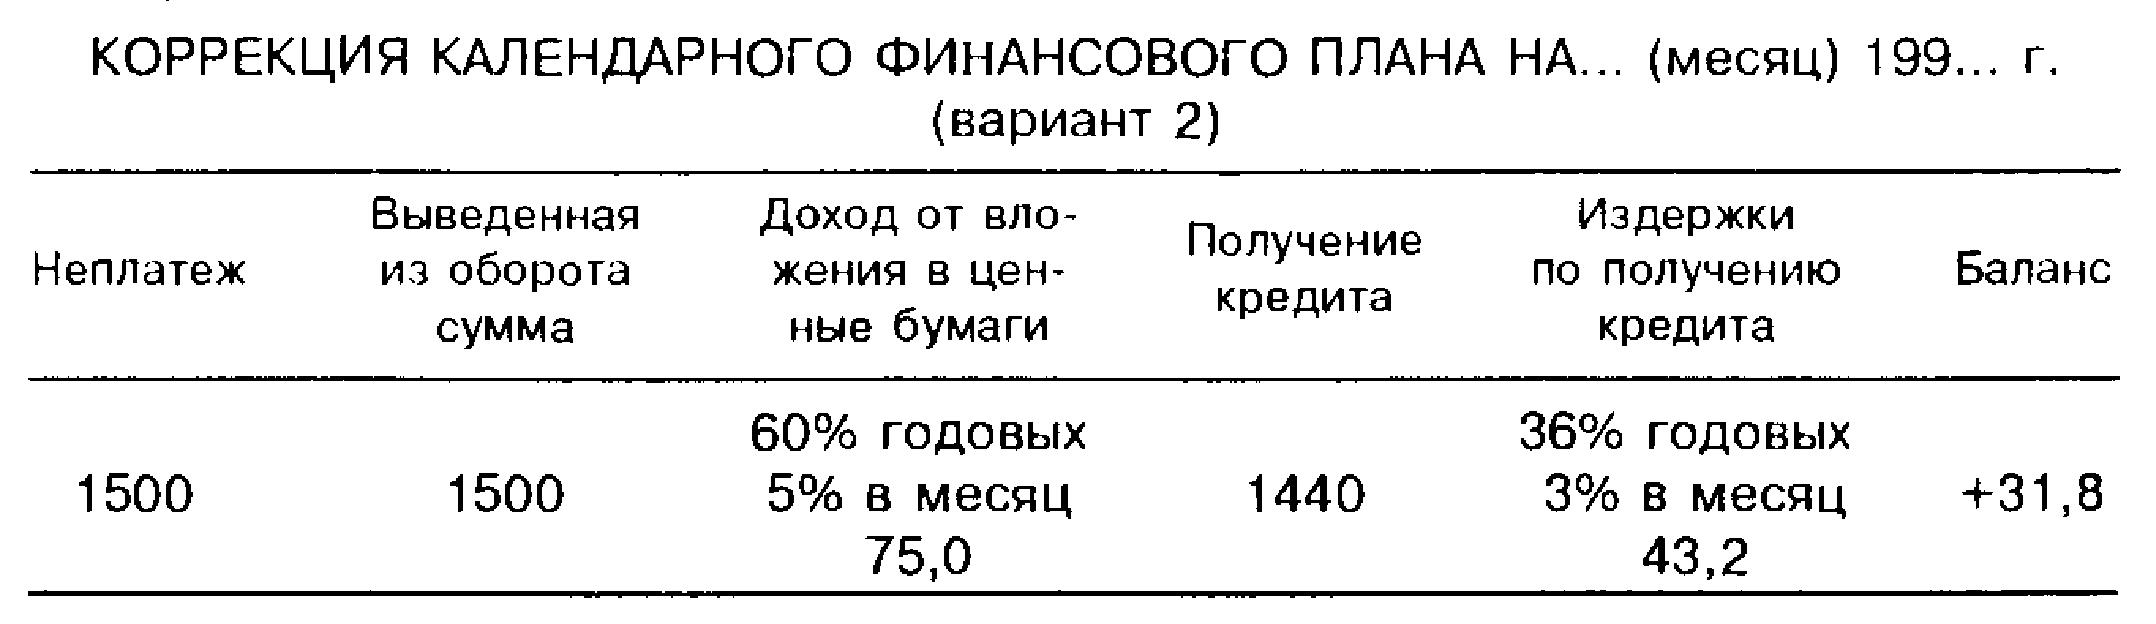 Календарный финансовый план на... (месяц) 199... г. 2